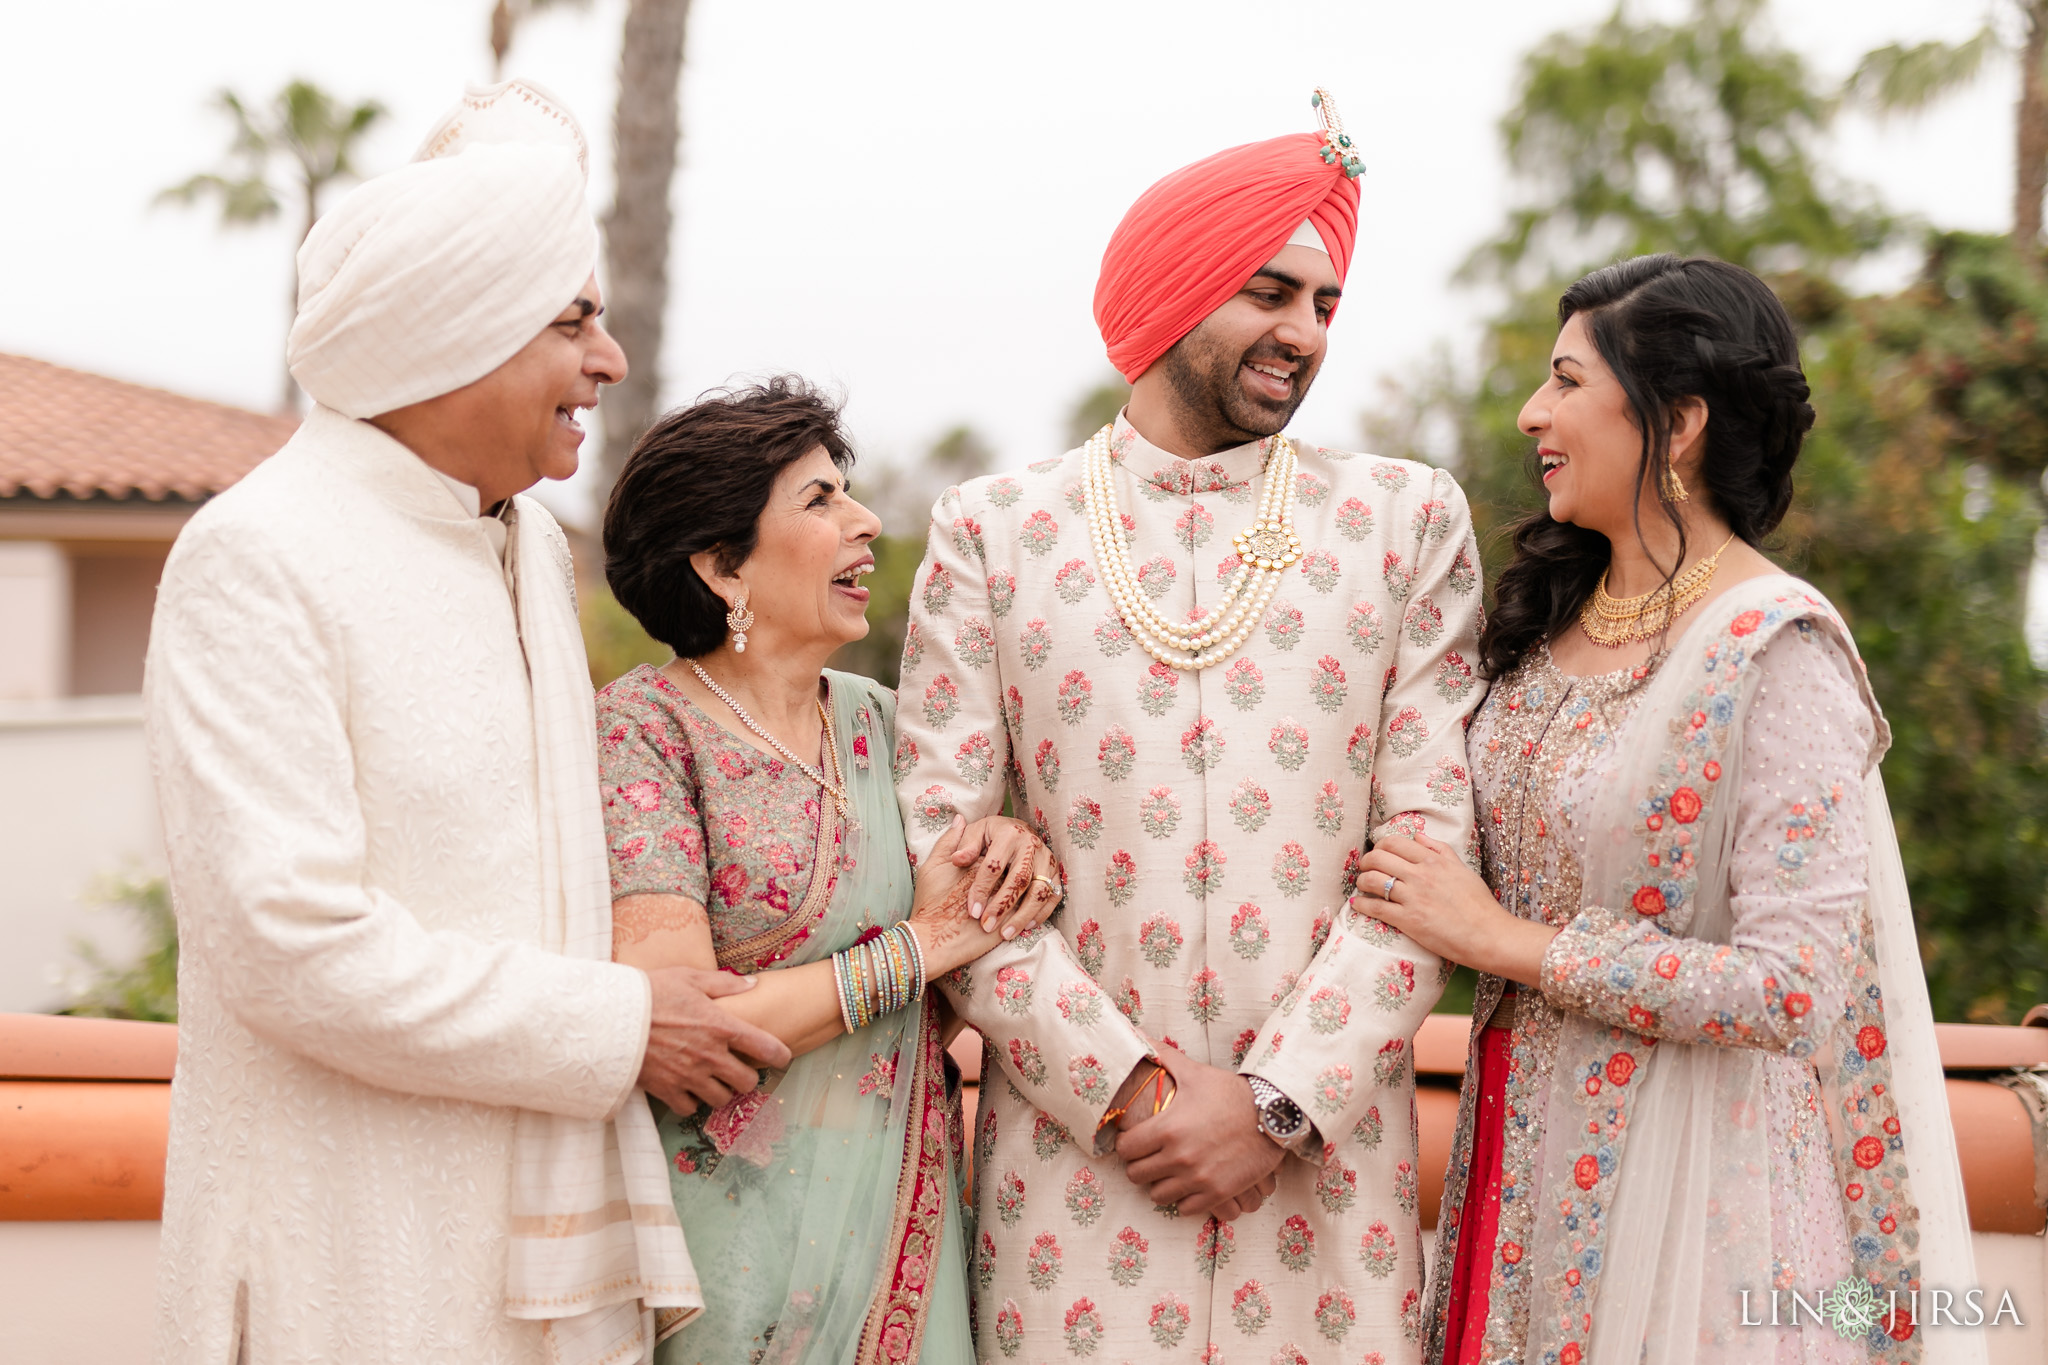 17 Hilton Santa Barbara Beachfront Resort Punjabi Indian Wedding Ceremony Photography